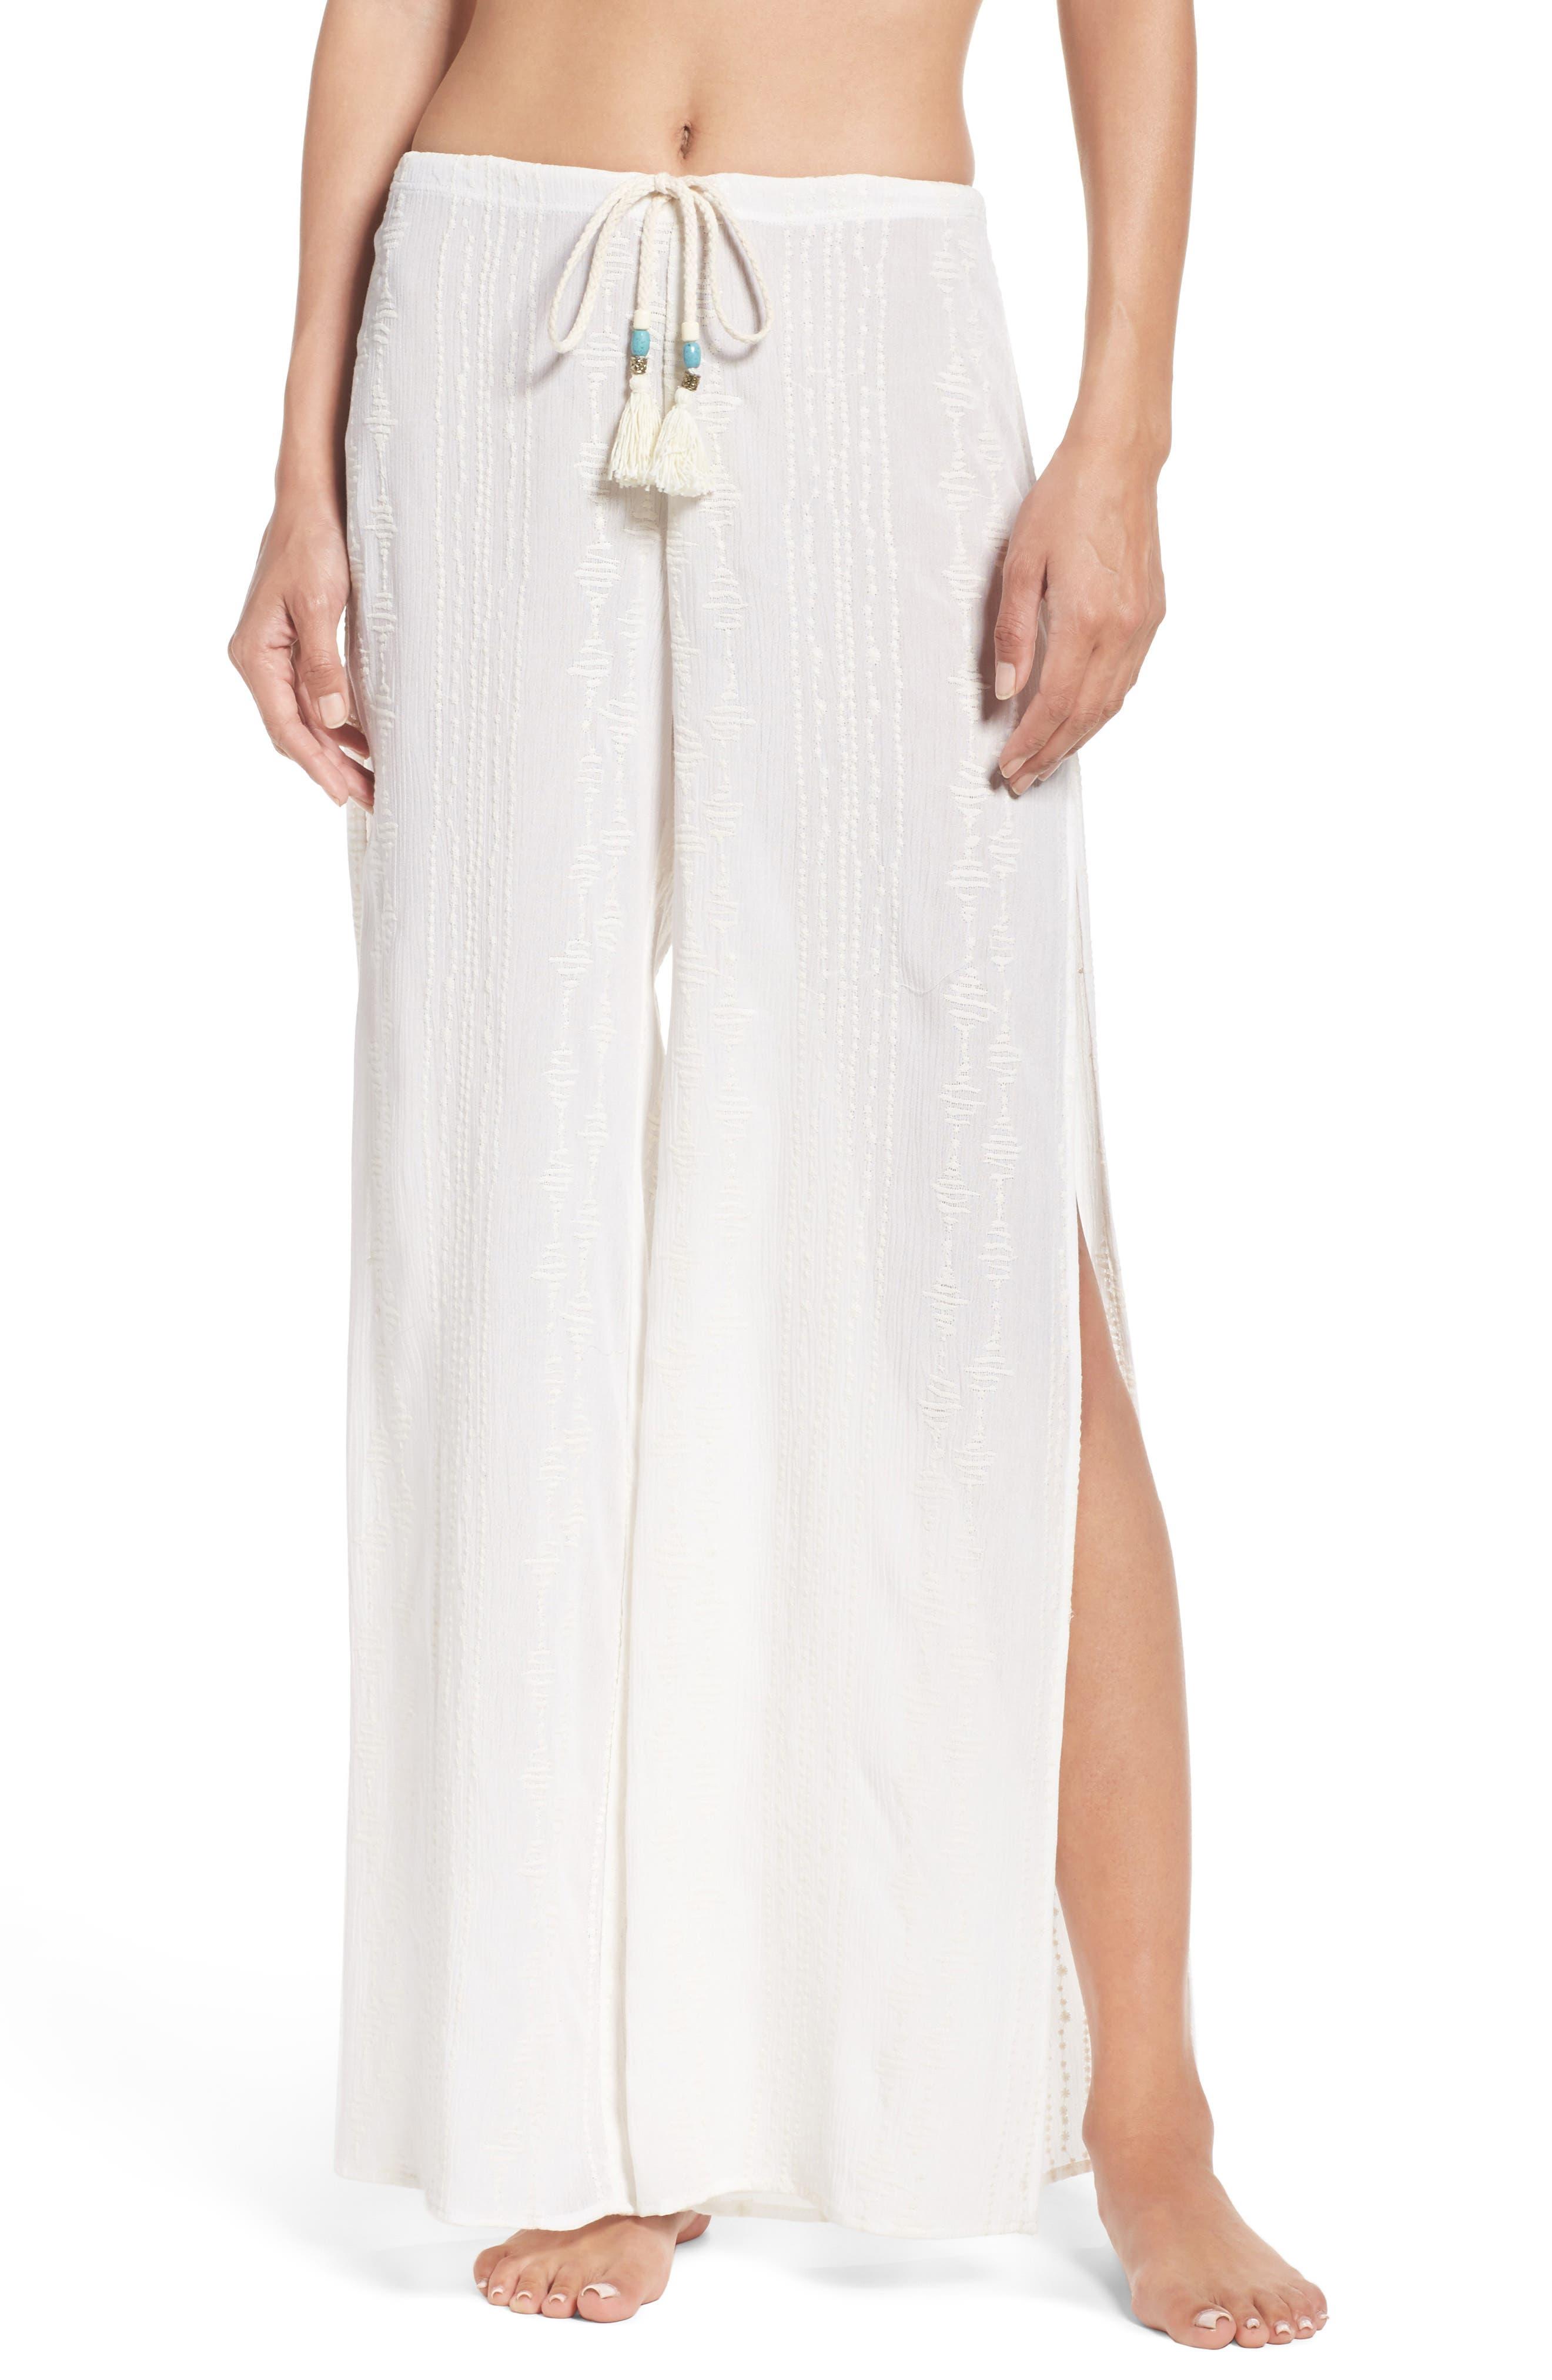 Becca Desert Vibes Cover-Up Pants